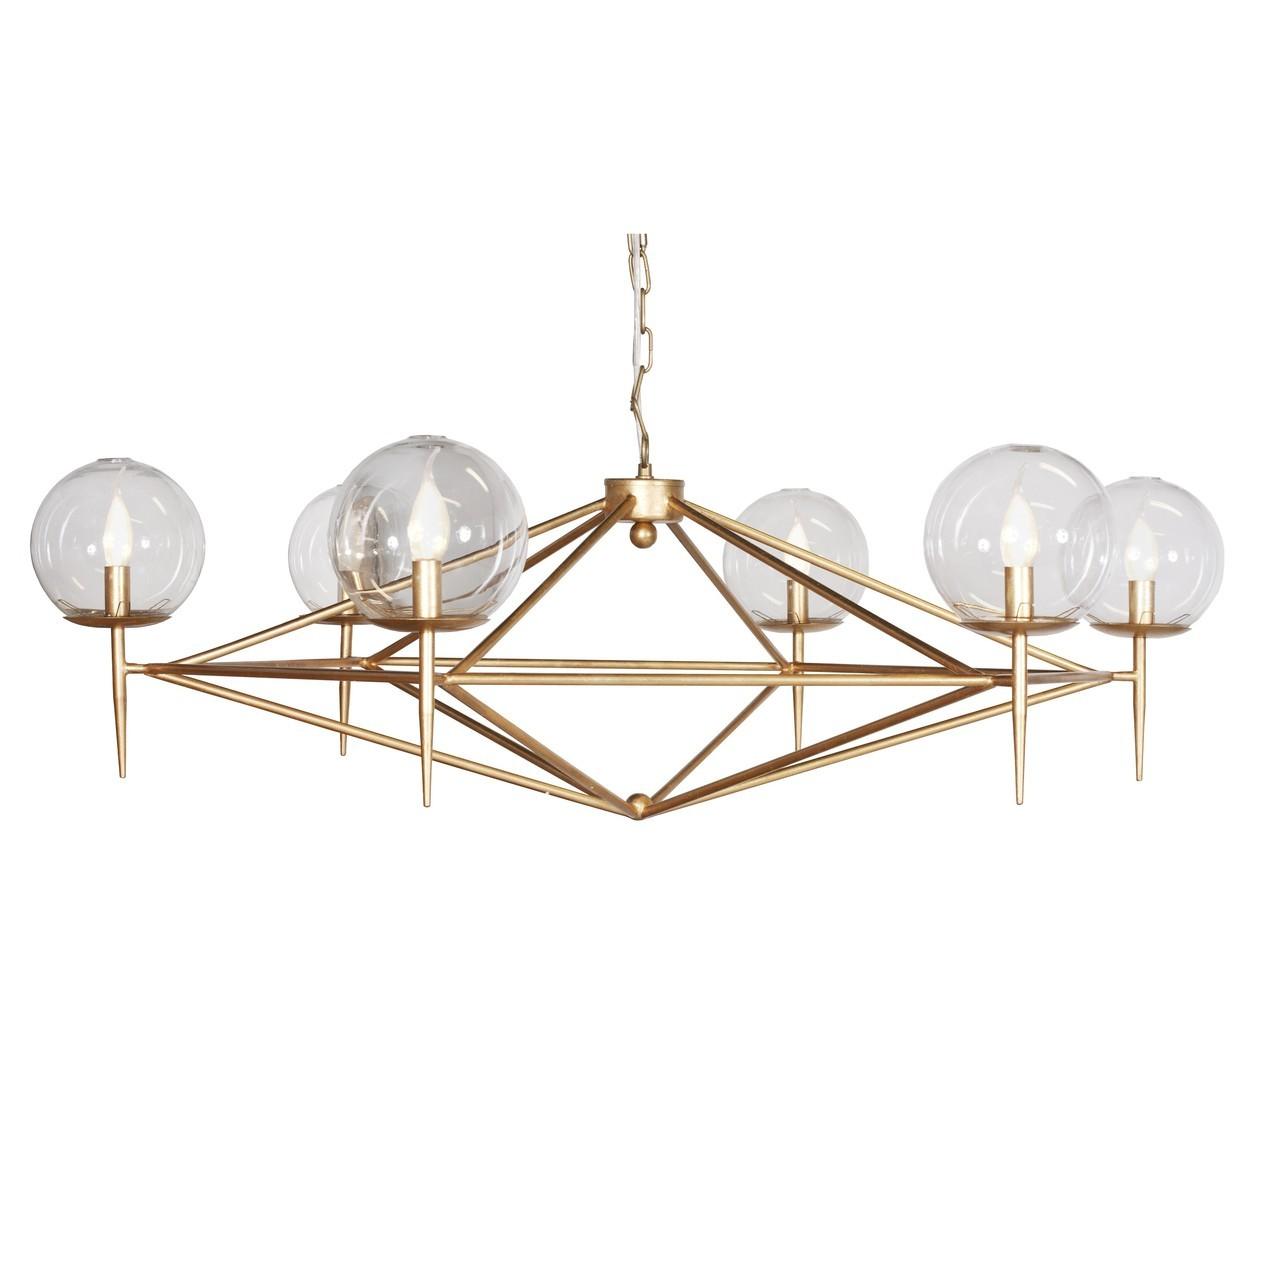 Worlds Away Rowan Chandelier with Hand Blown Glass Globes